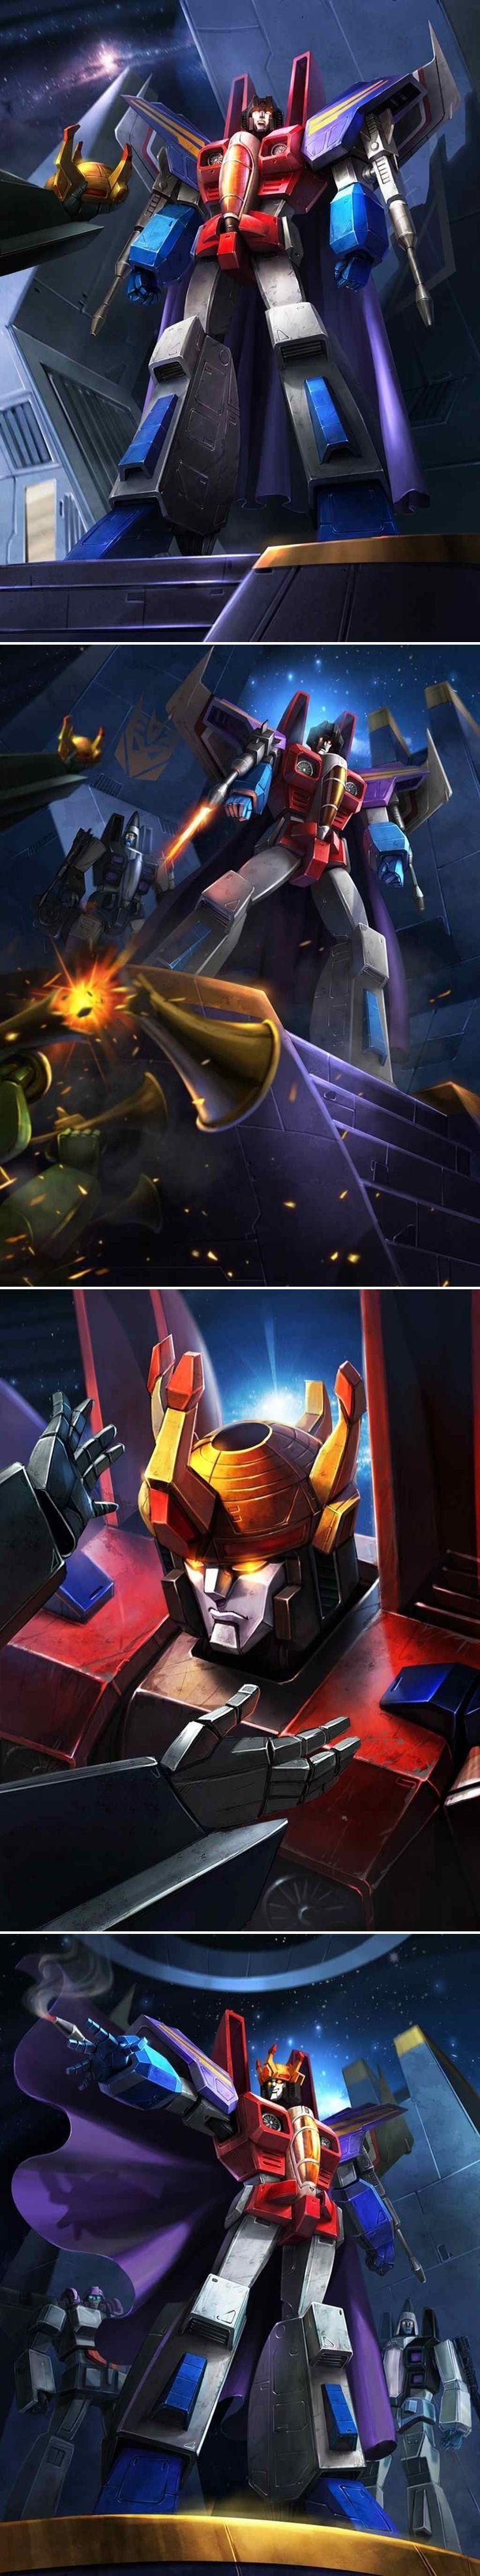 Transformers - Legends - The Coronation of Starscream by manbu1977 on deviantART